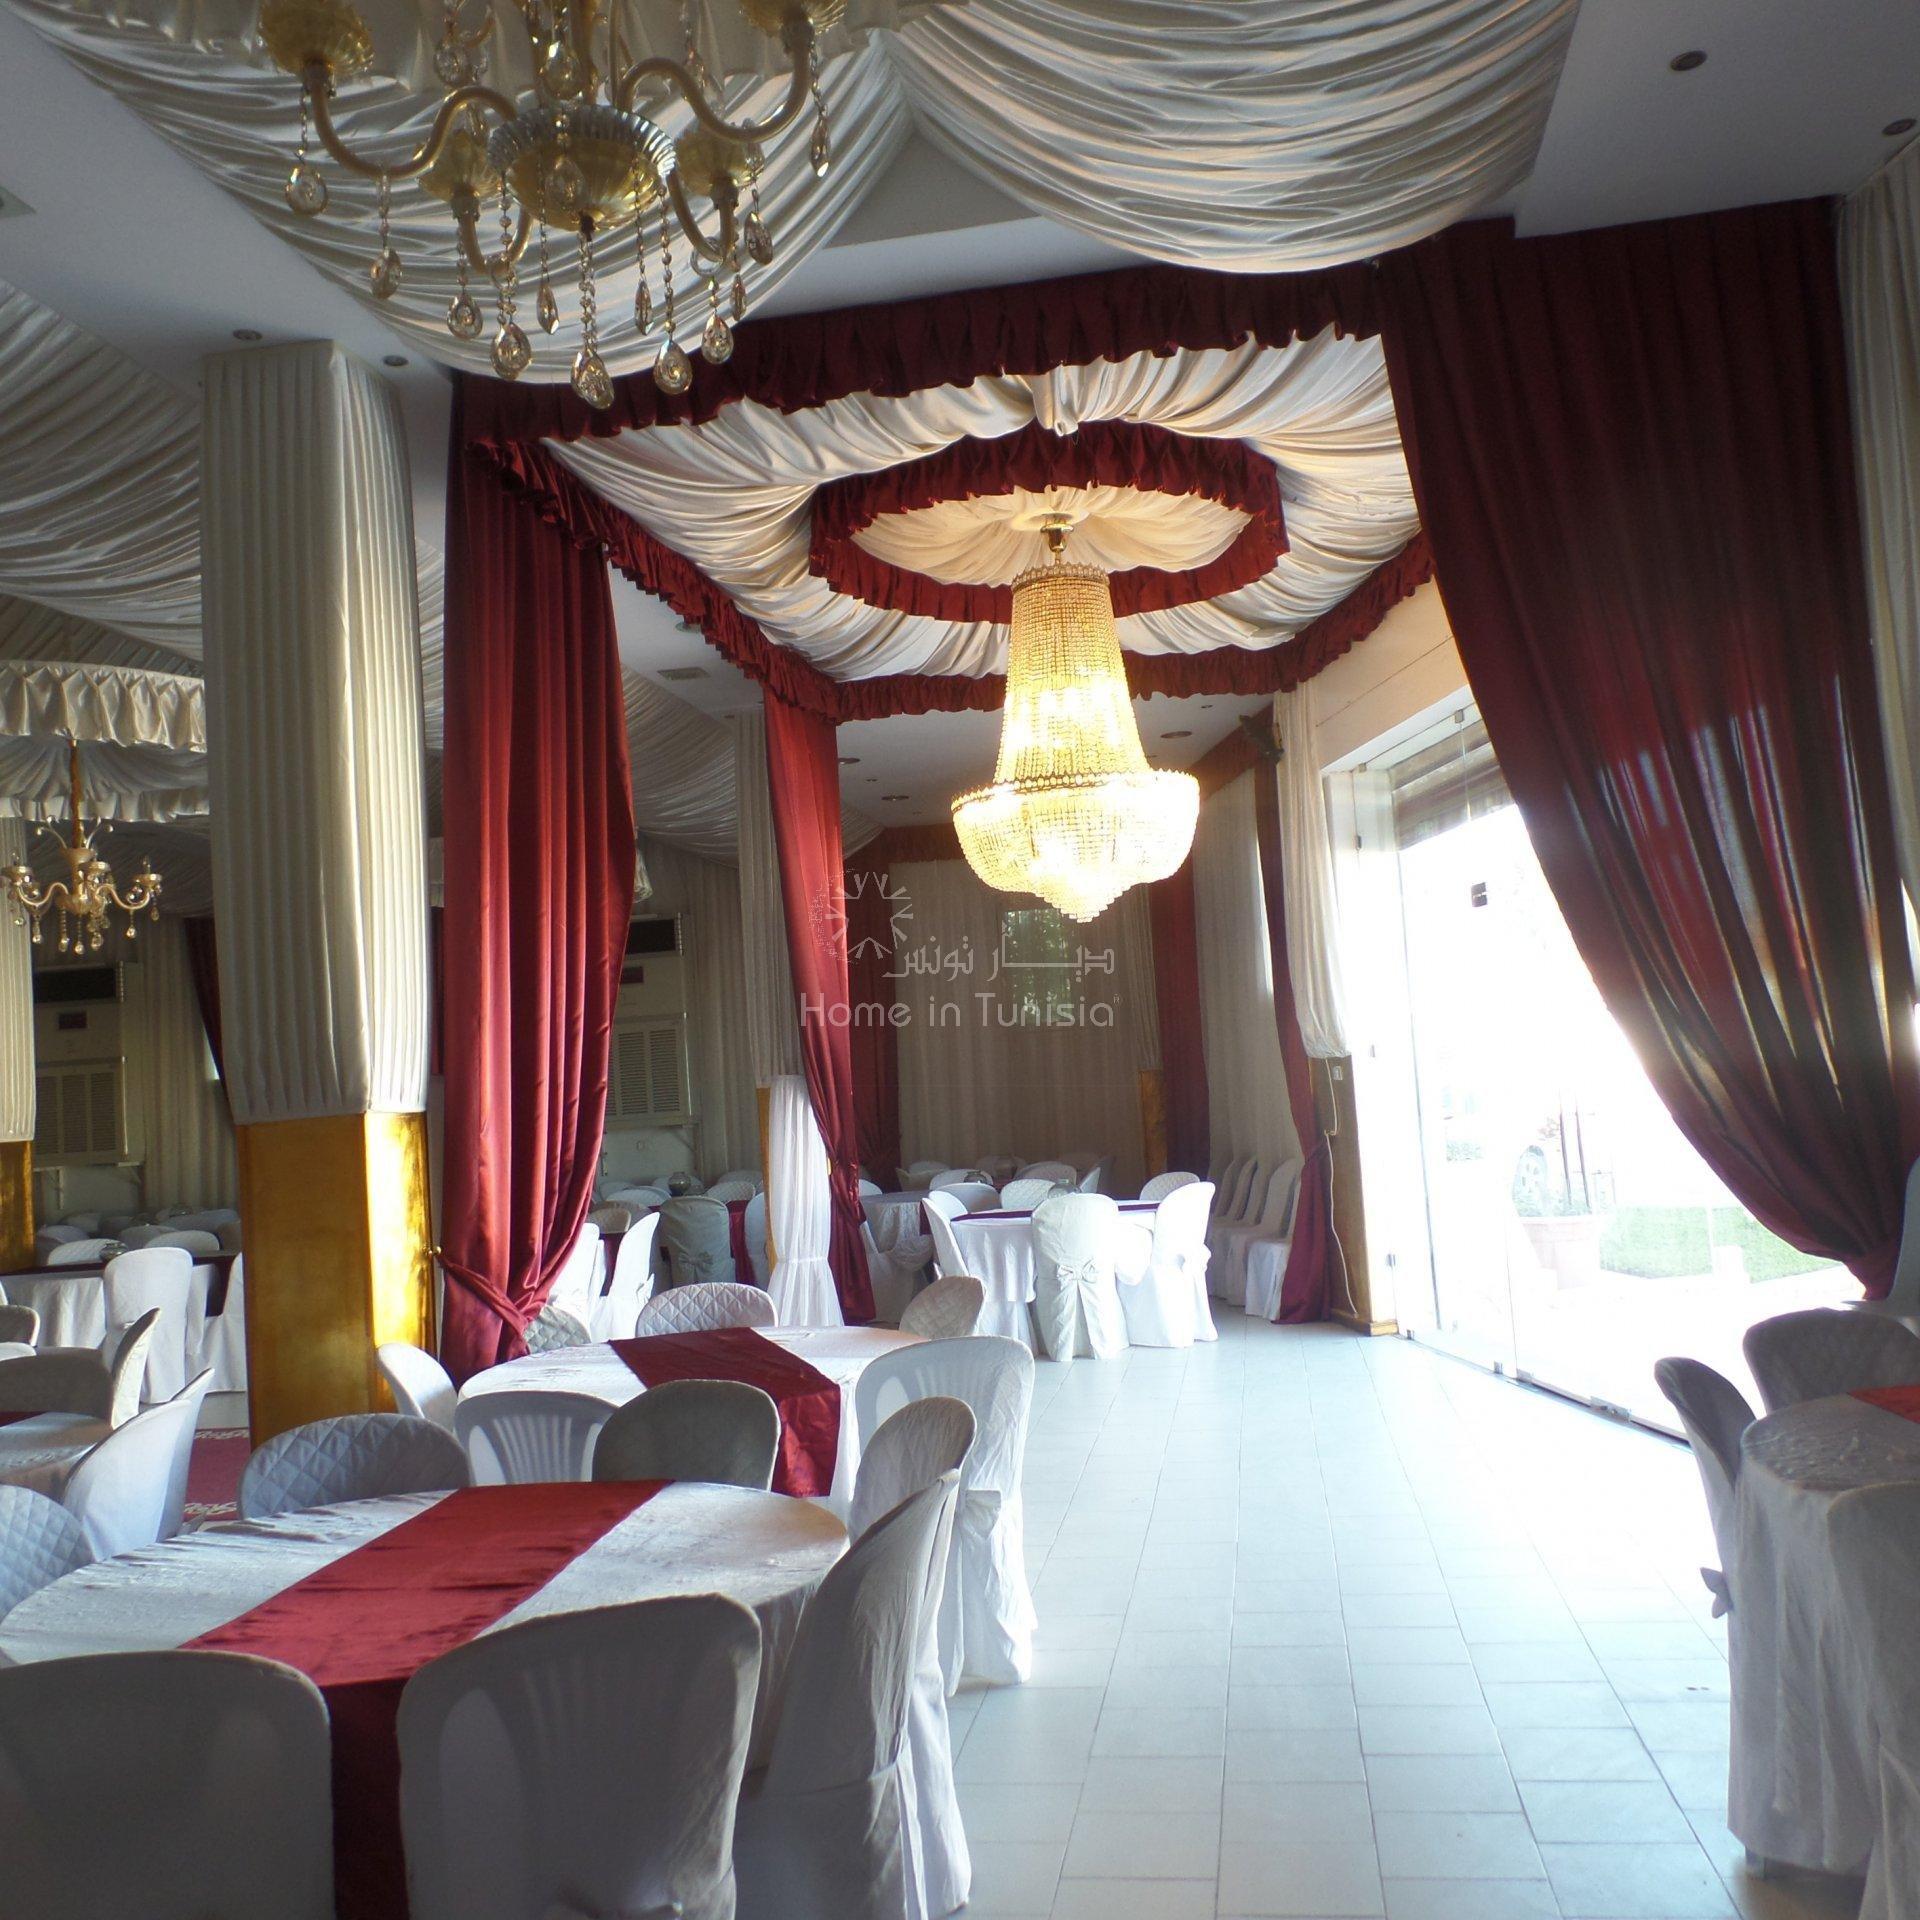 Sale Business - Nabeul - Tunisia